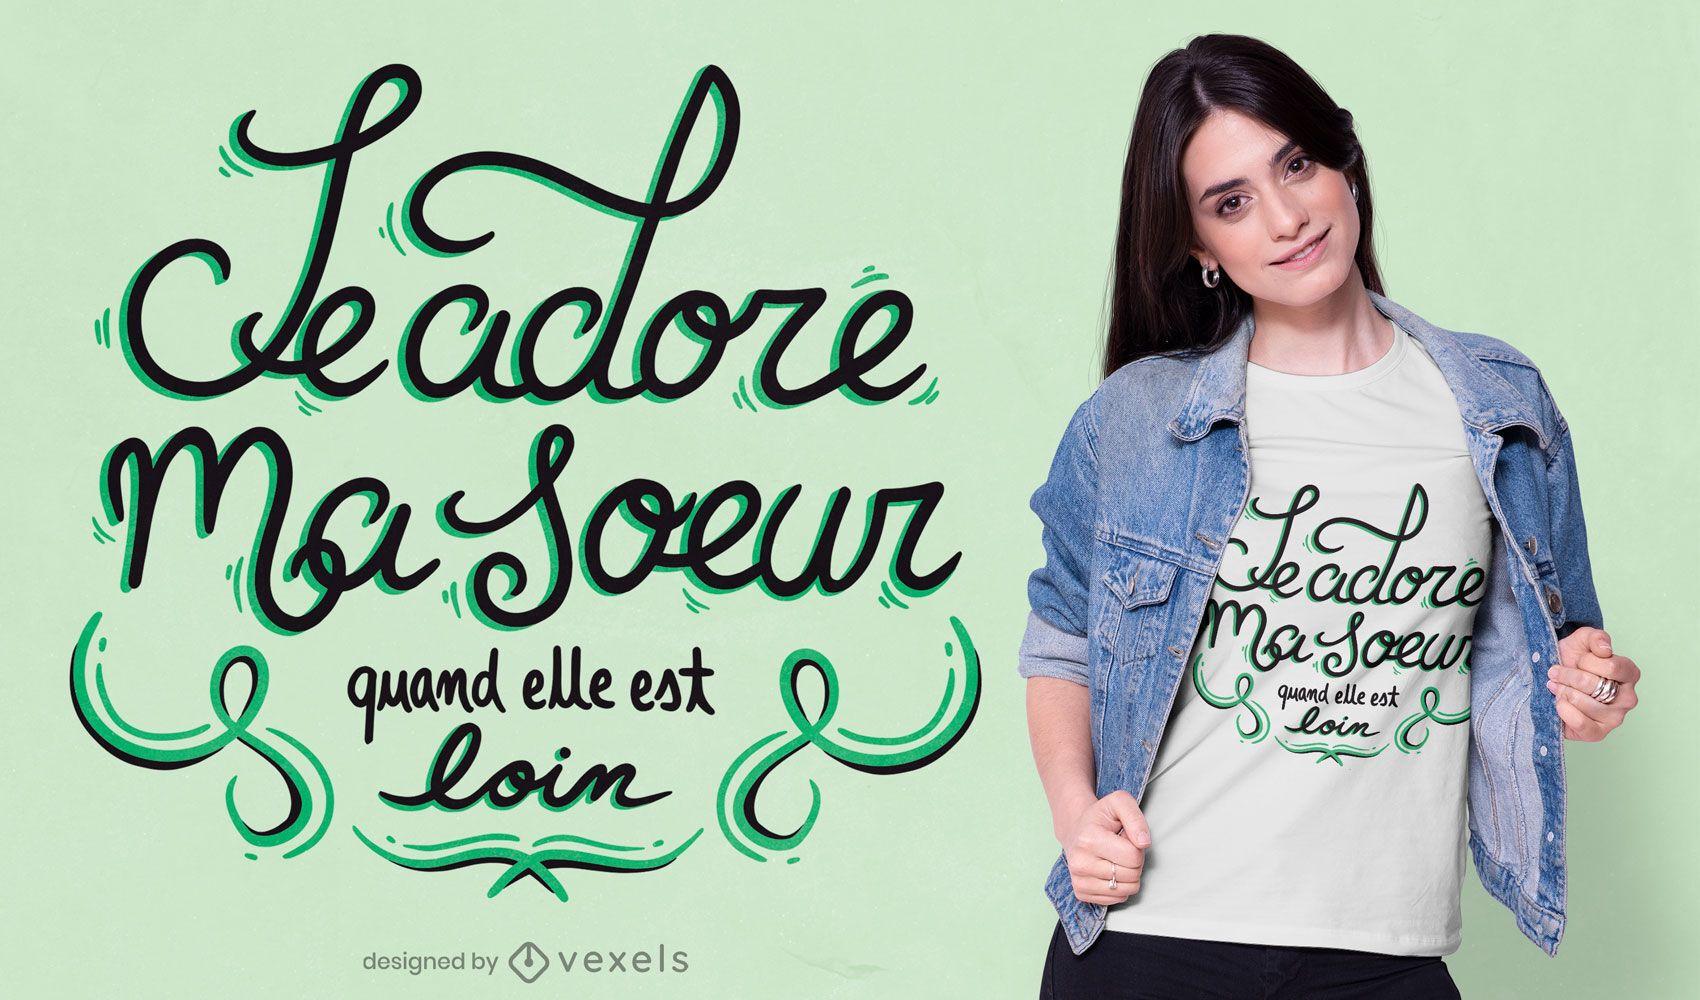 Love sister french t-shirt design